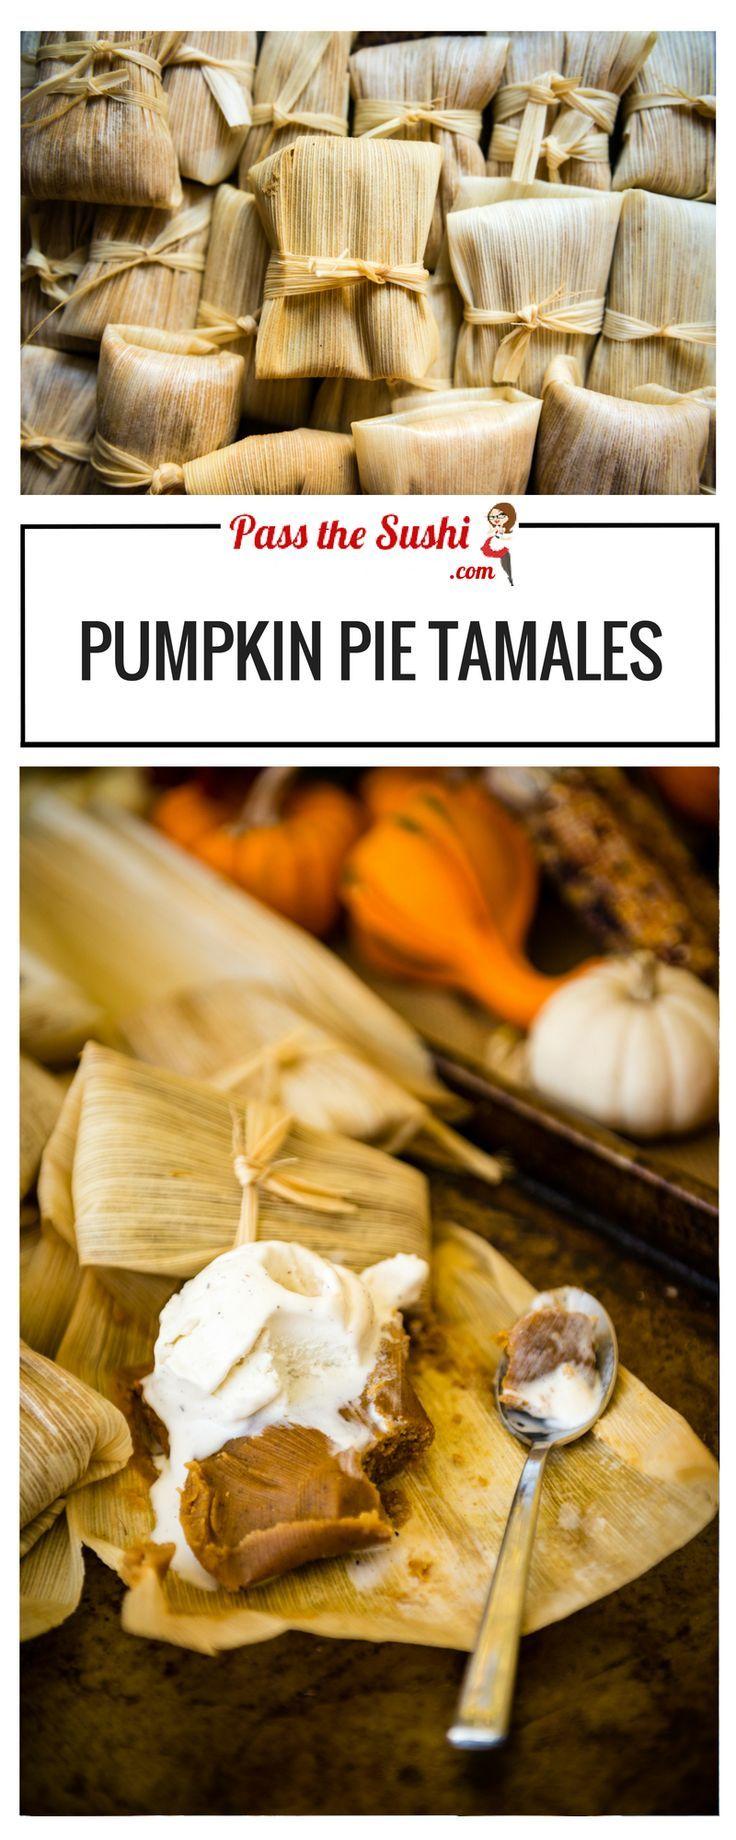 Pumpkin Pie Tamales | Recipe at http://PasstheSushi.com